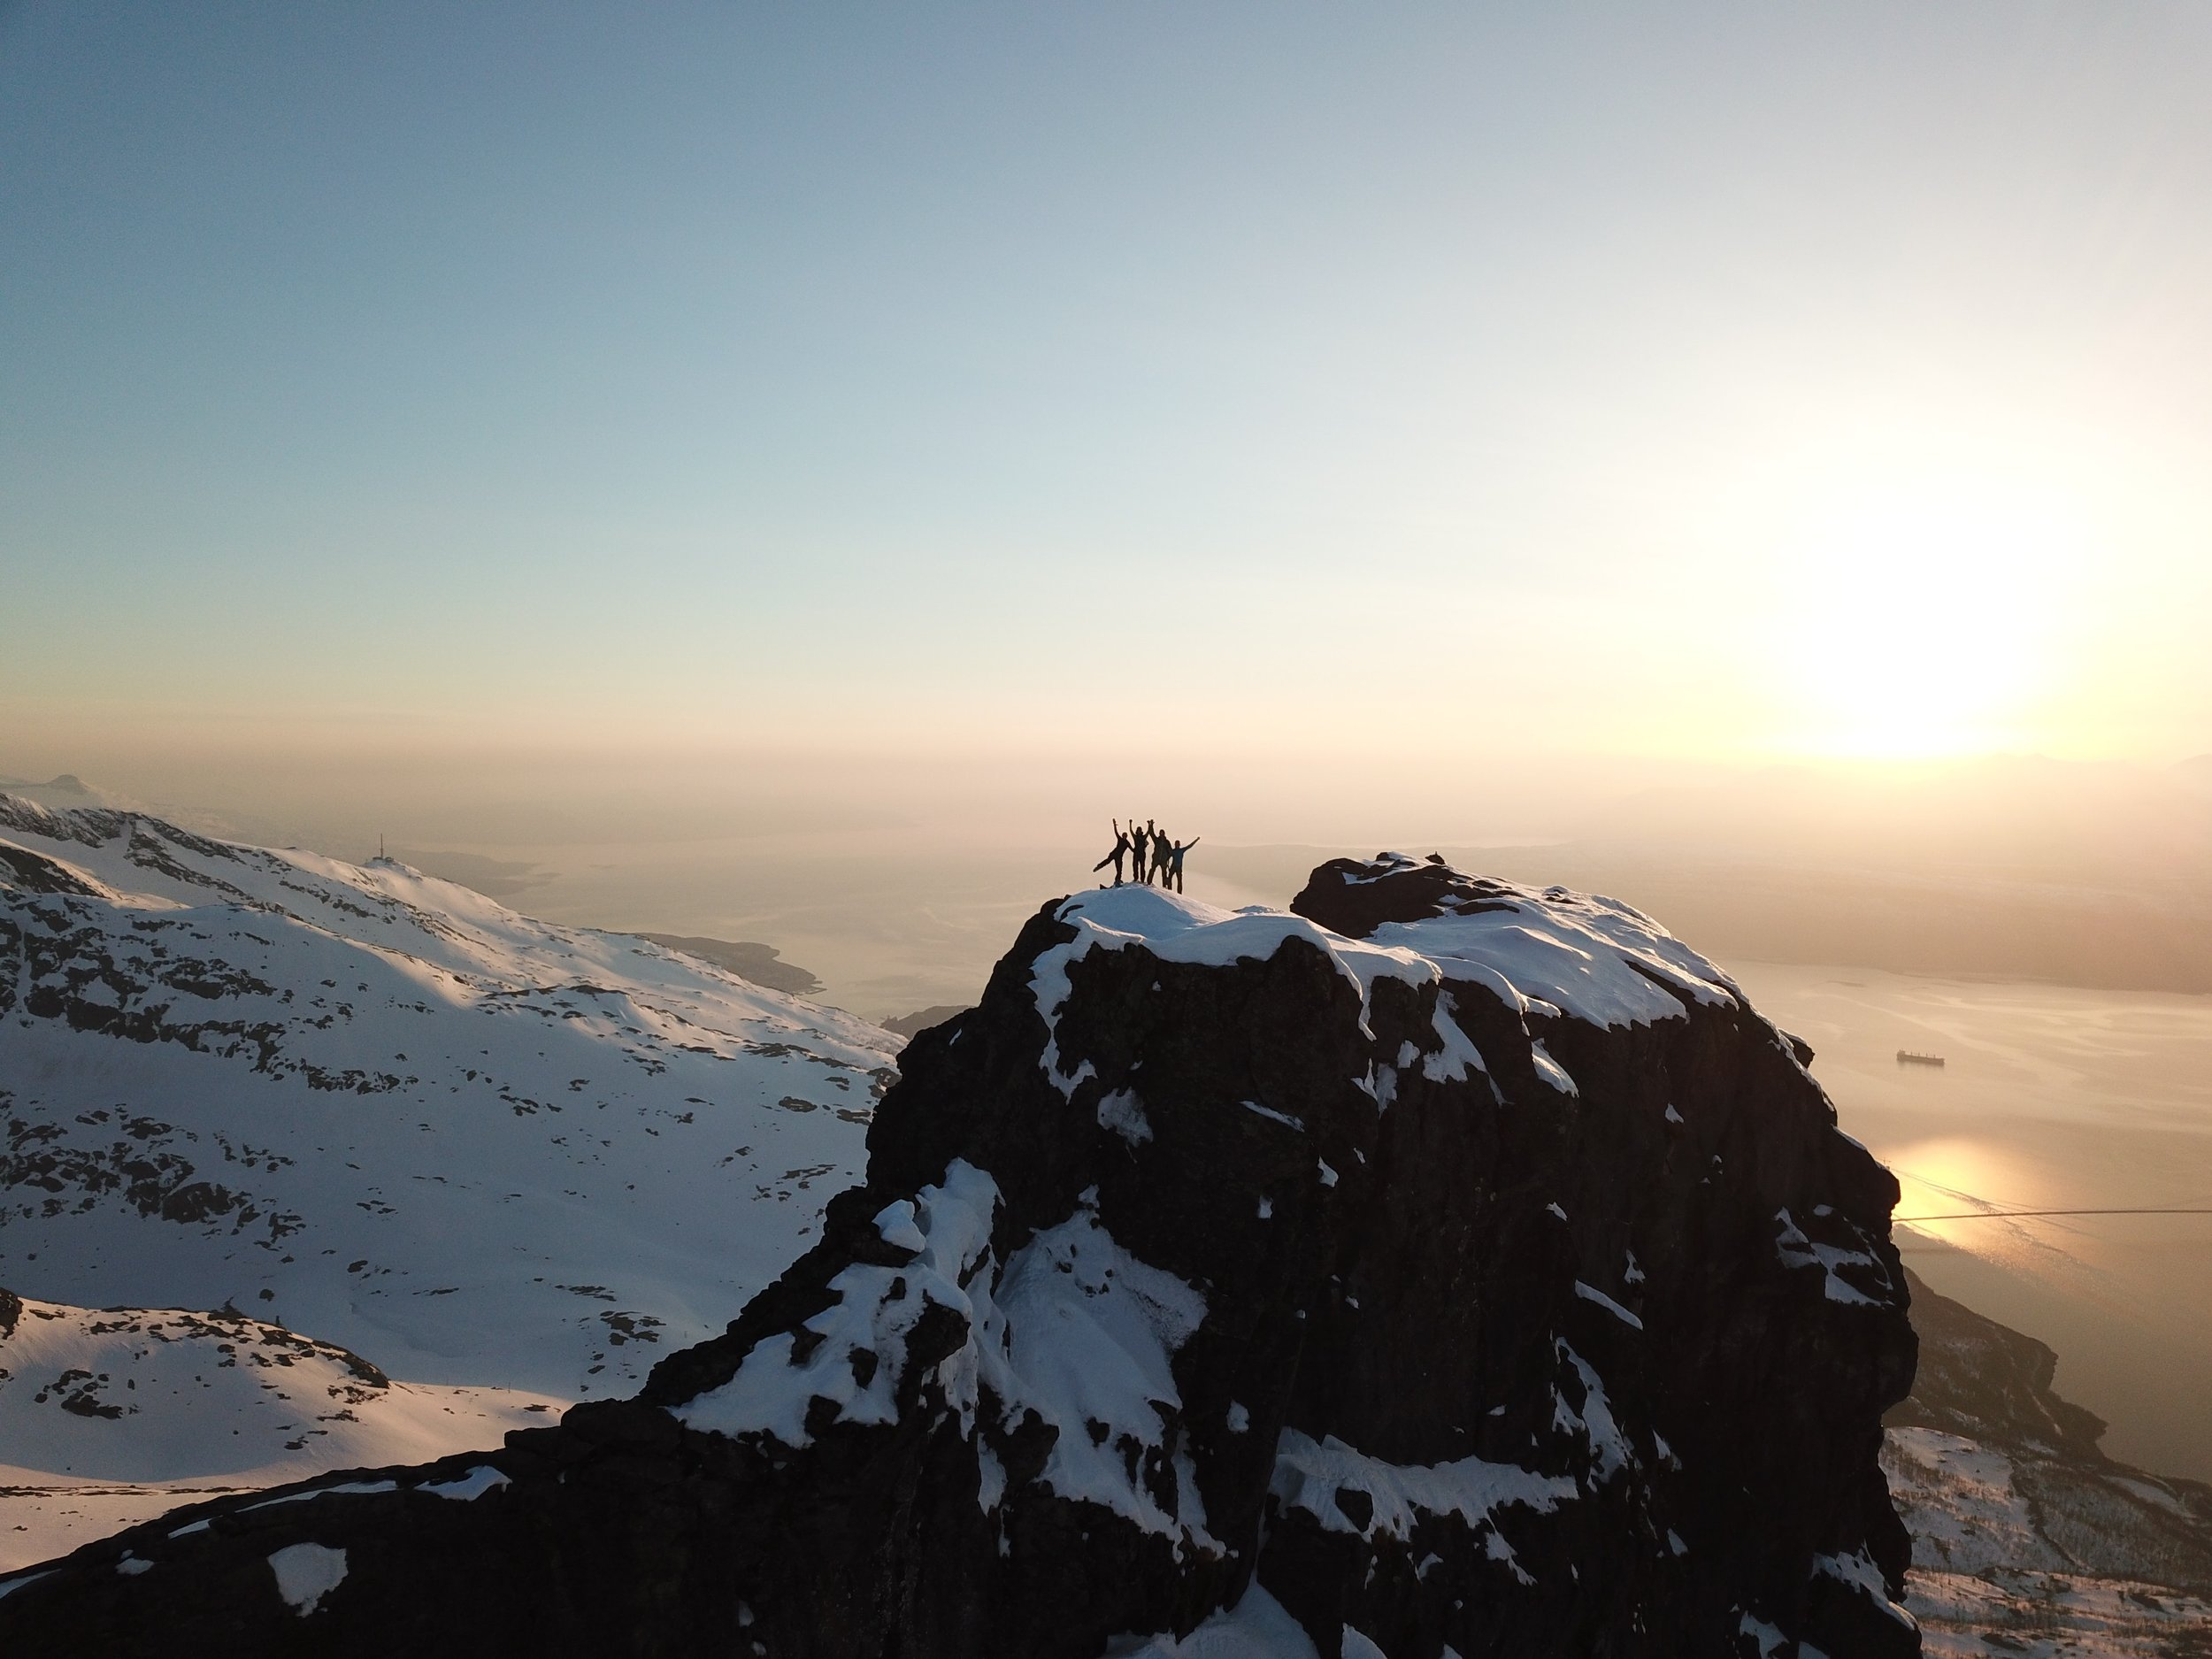 adventure-altitude-cold-2403502.jpg